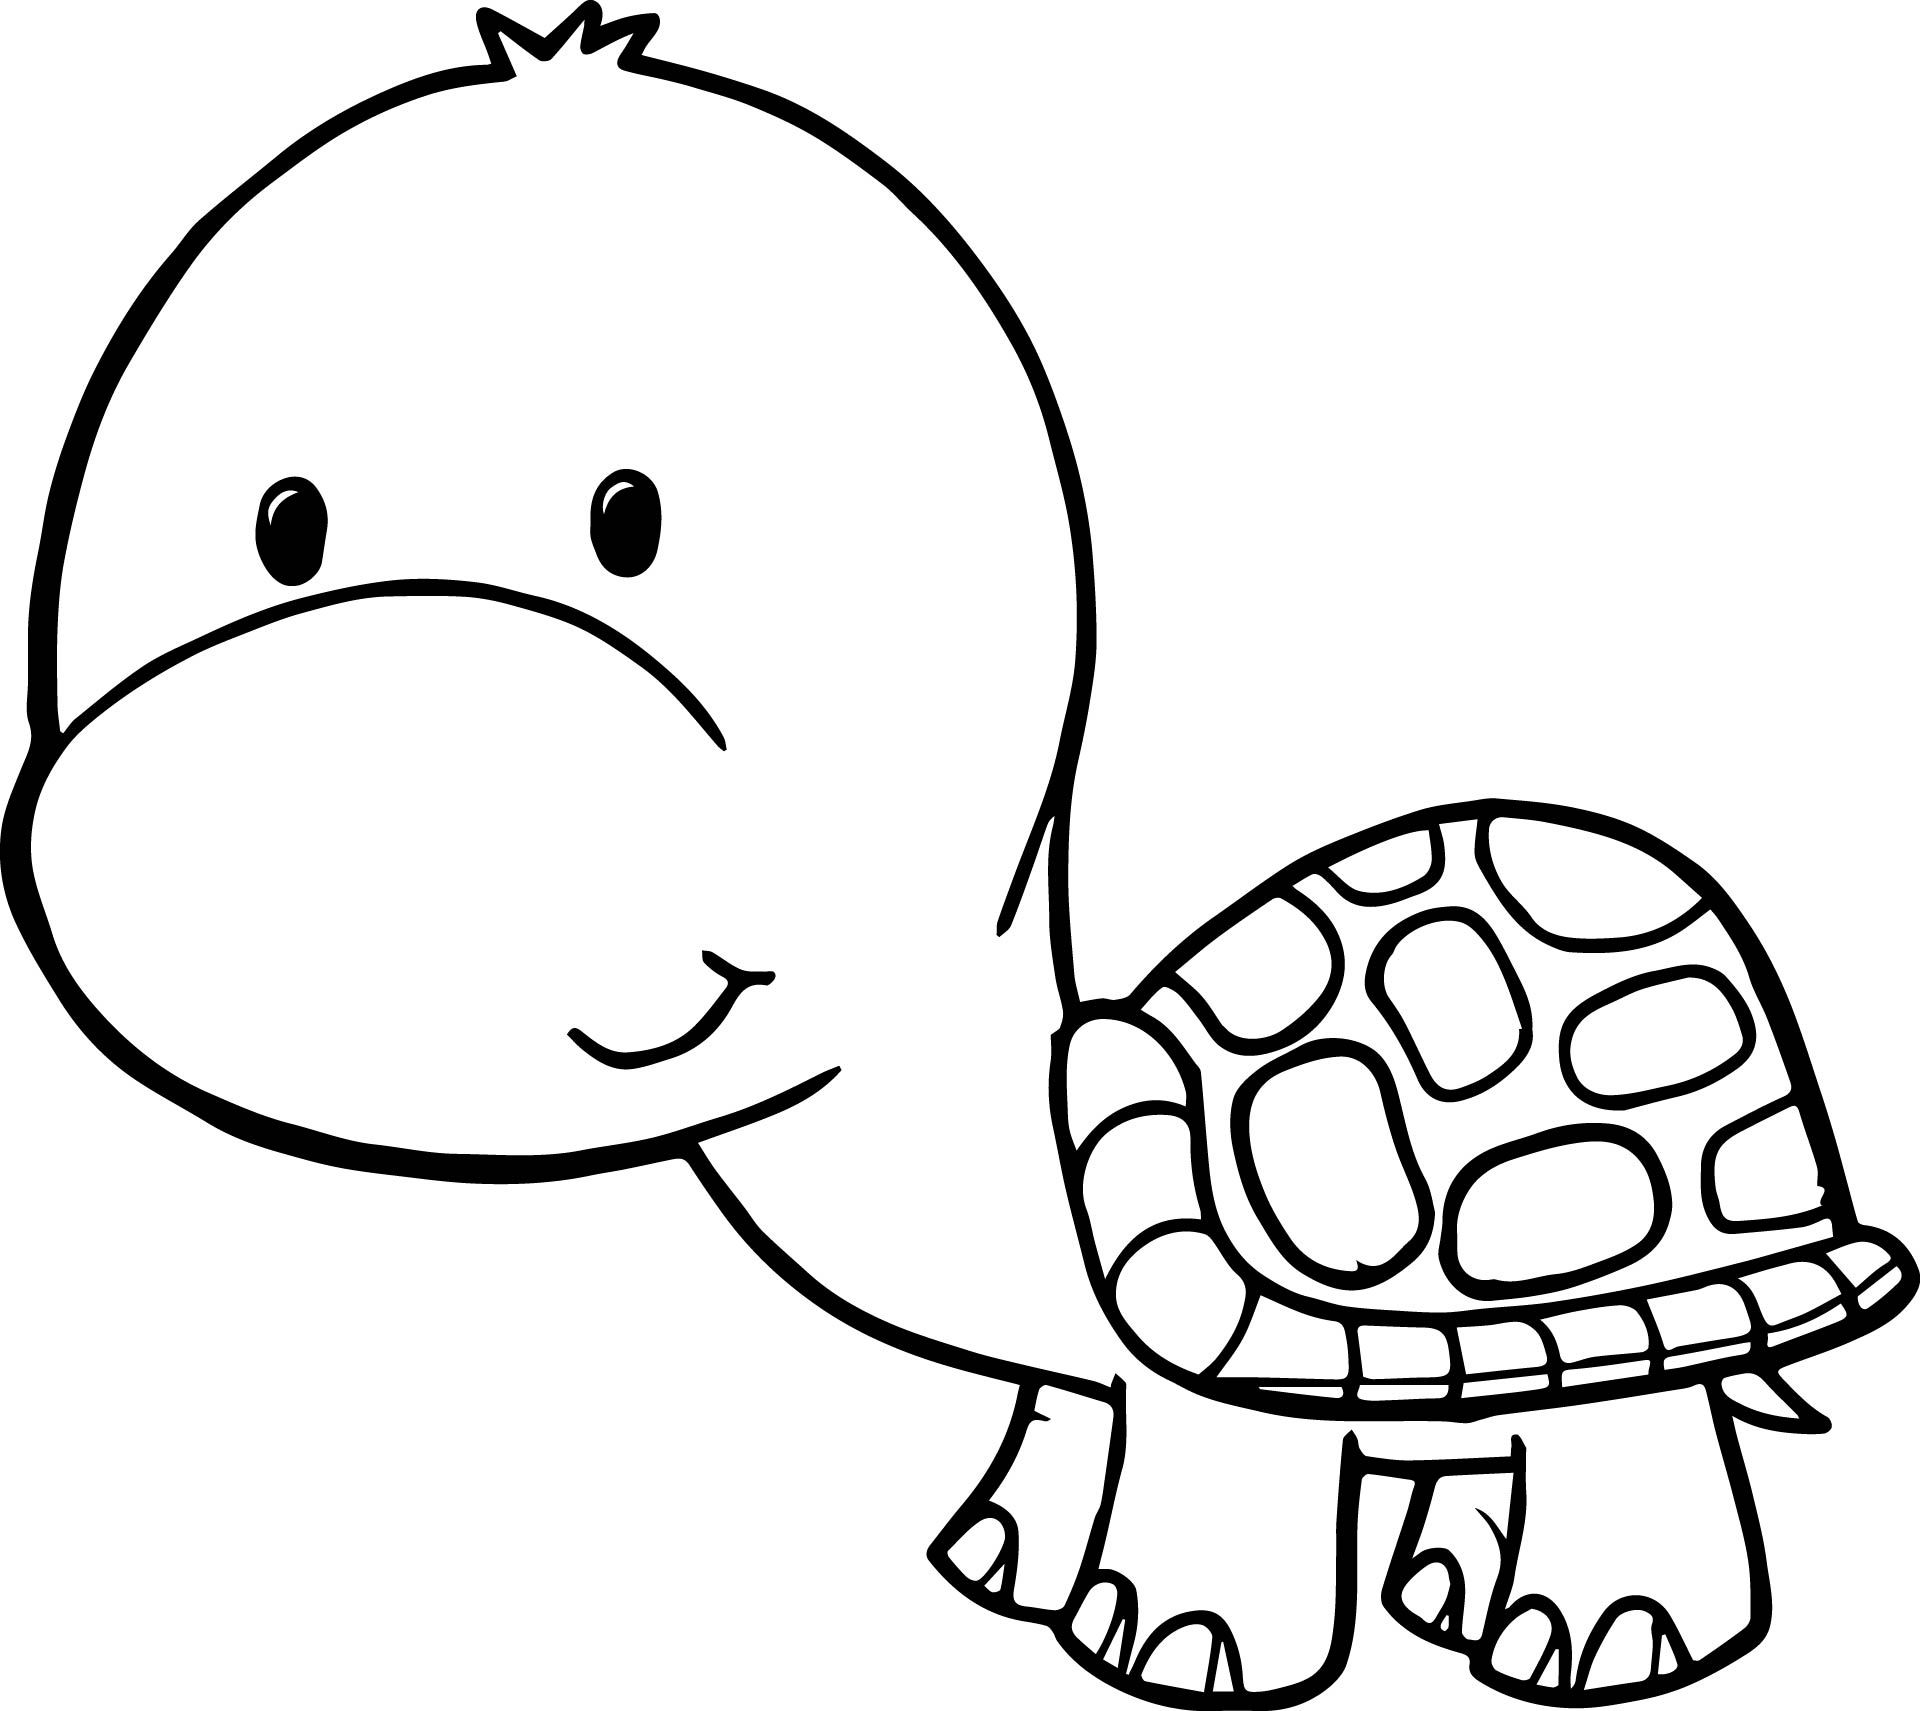 1920x1711 Cute Cartoon Turtle Wallpapers